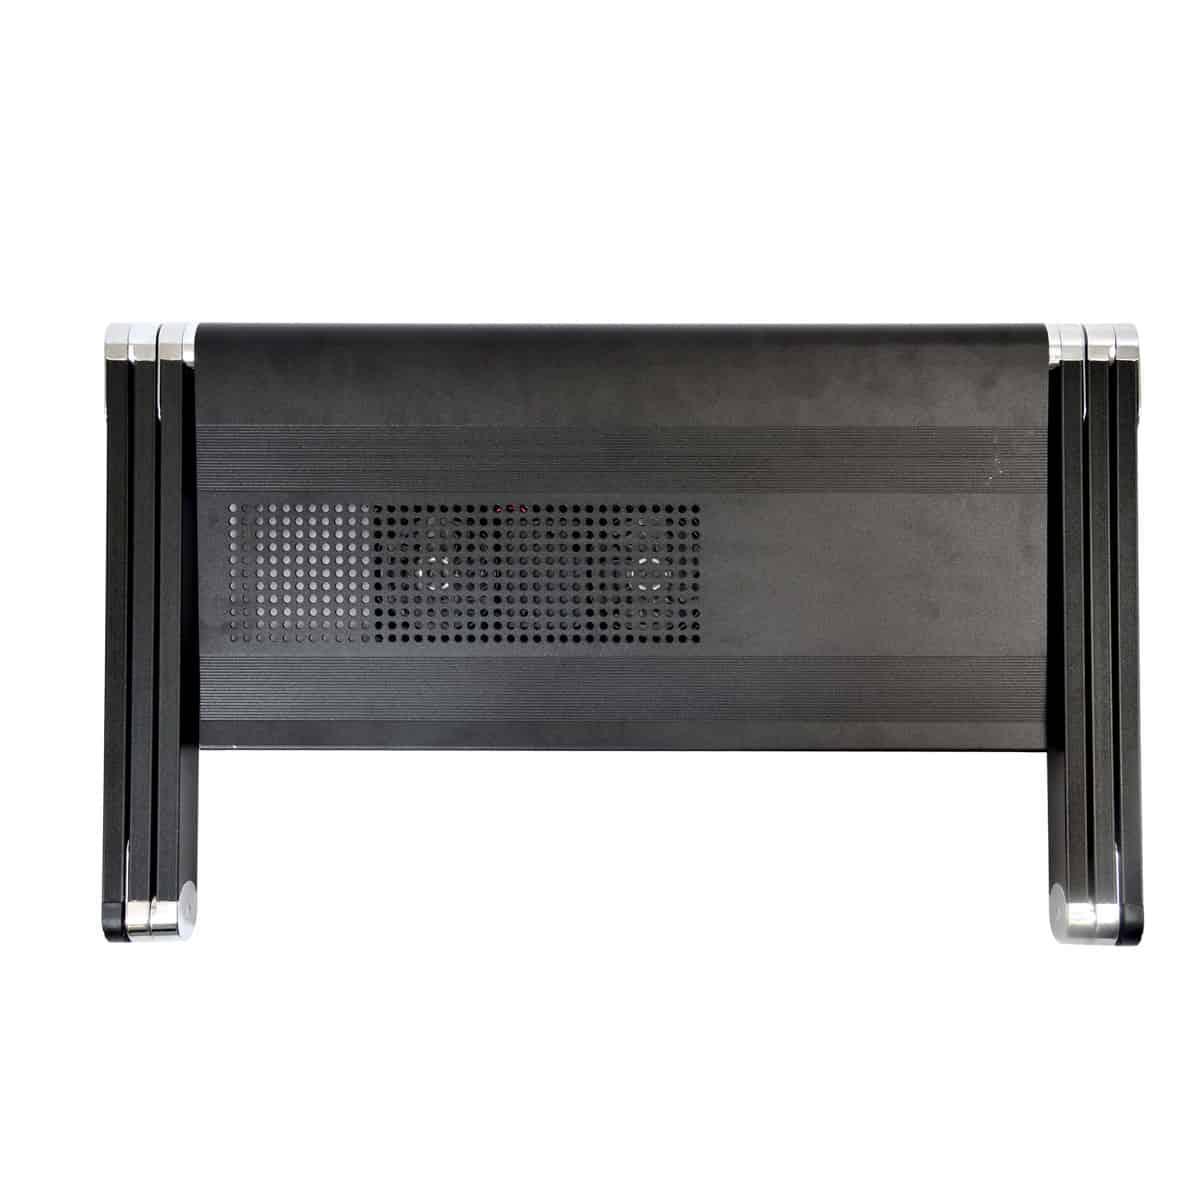 Thanko Super Gorone Desk Cooler Fan Details